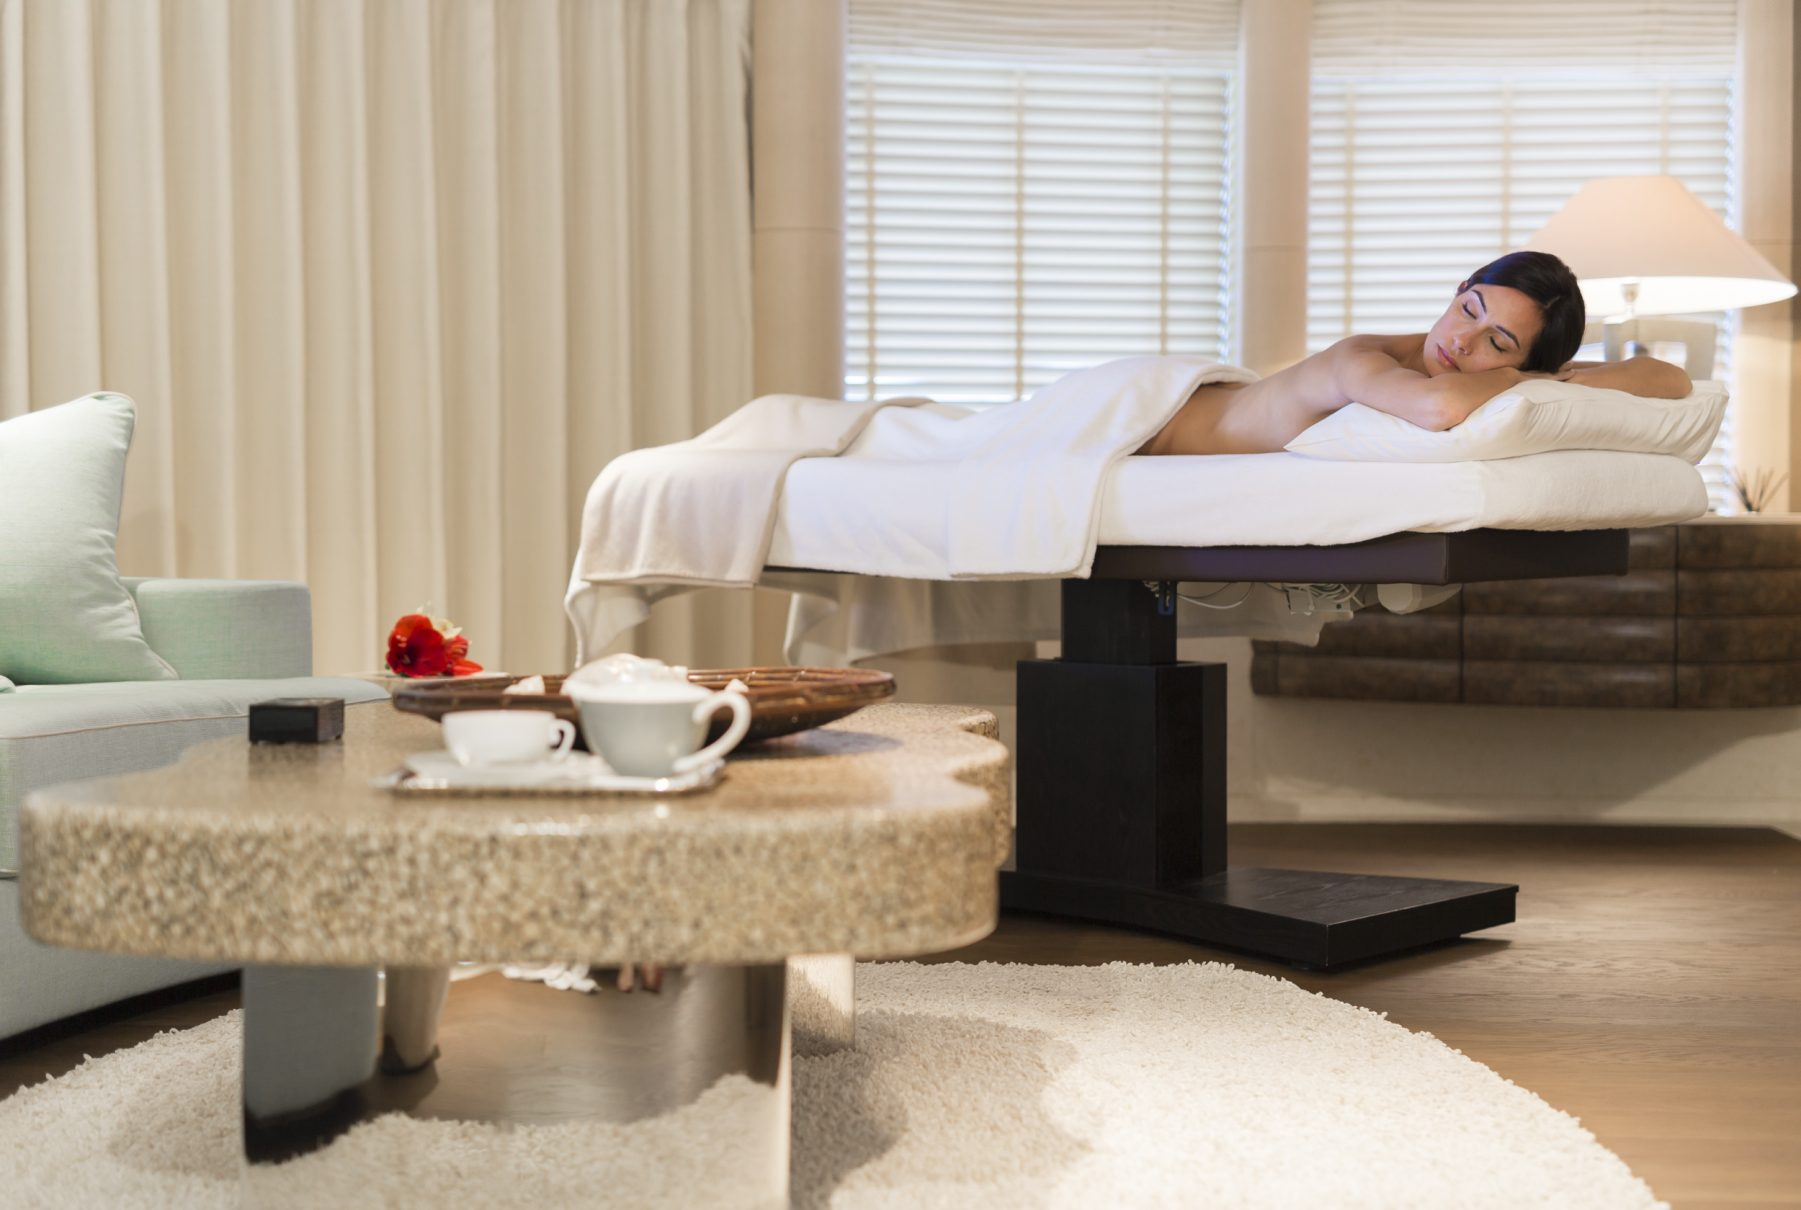 Yacht RoMEA By Abeking & Rasmussen - Wellness Massage